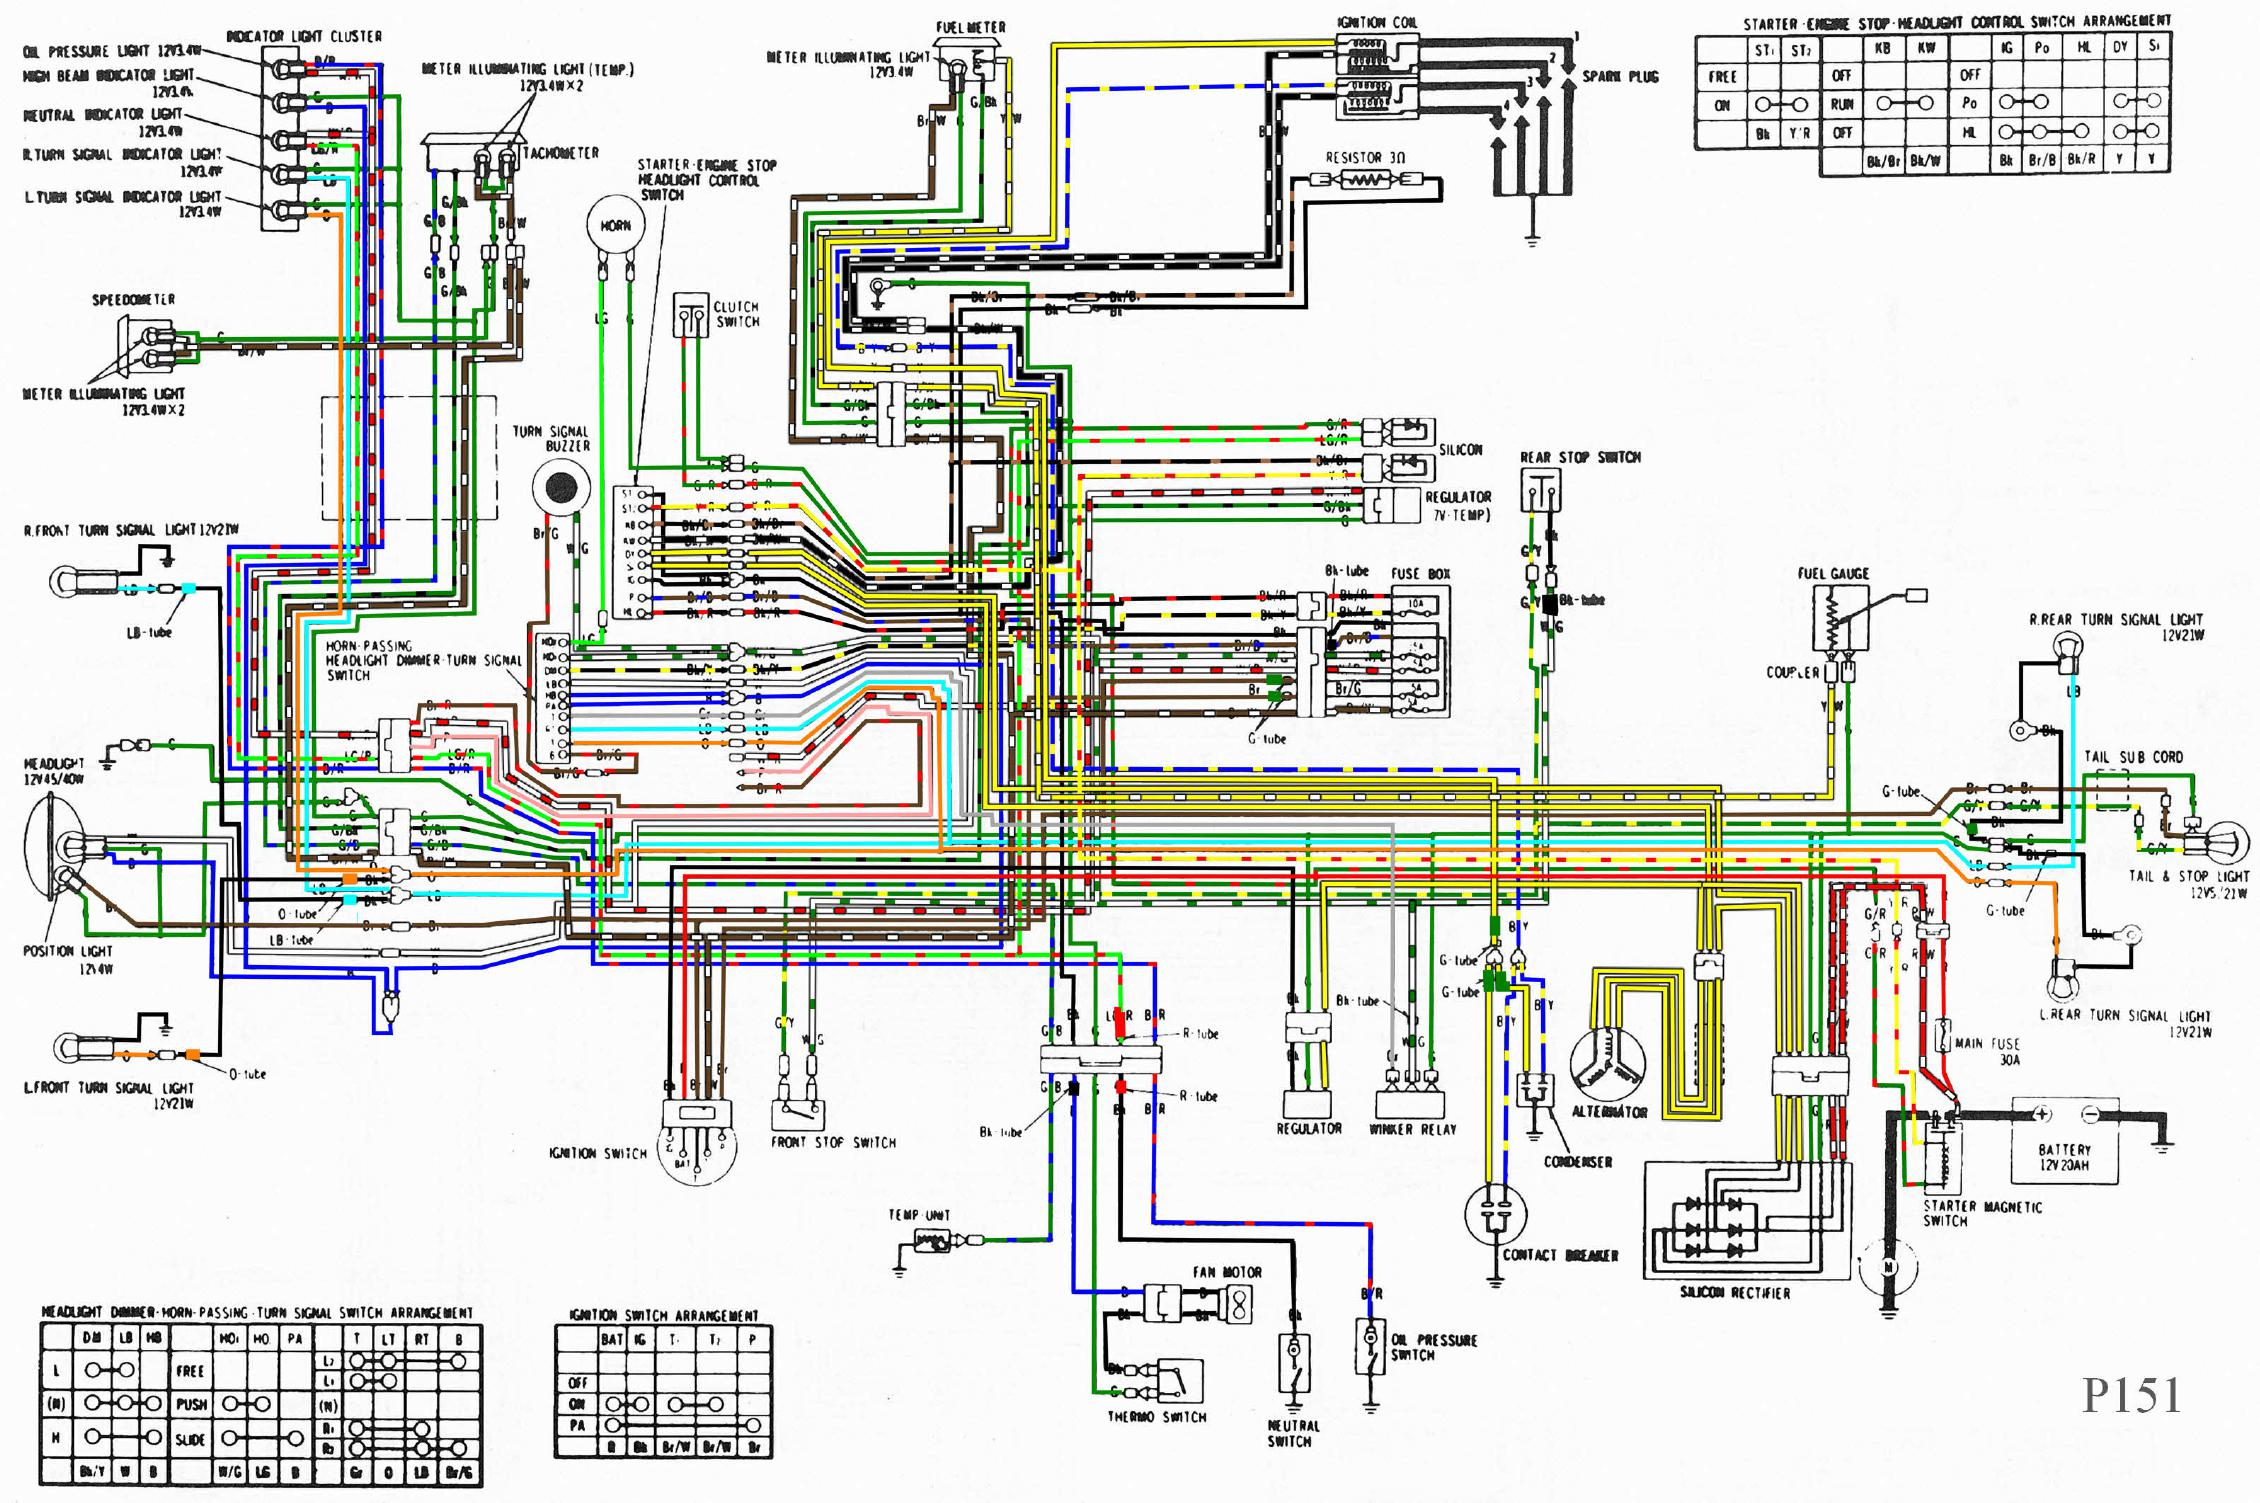 2004 Goldwing Wiring Diagram | Wiring Library